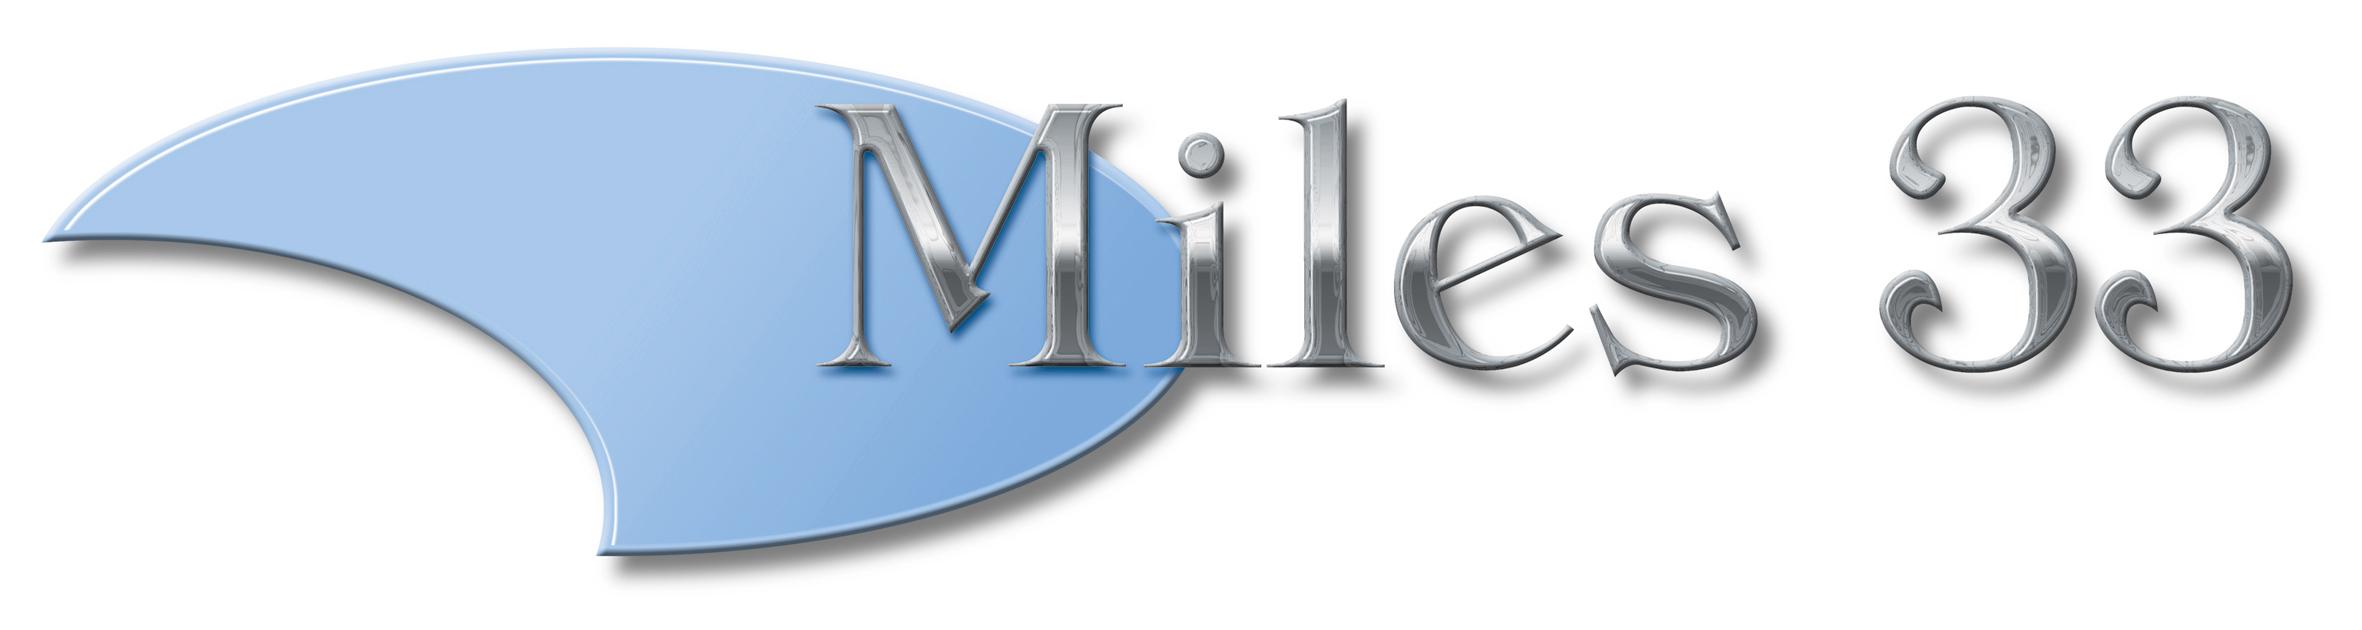 Miles 33 Ltd